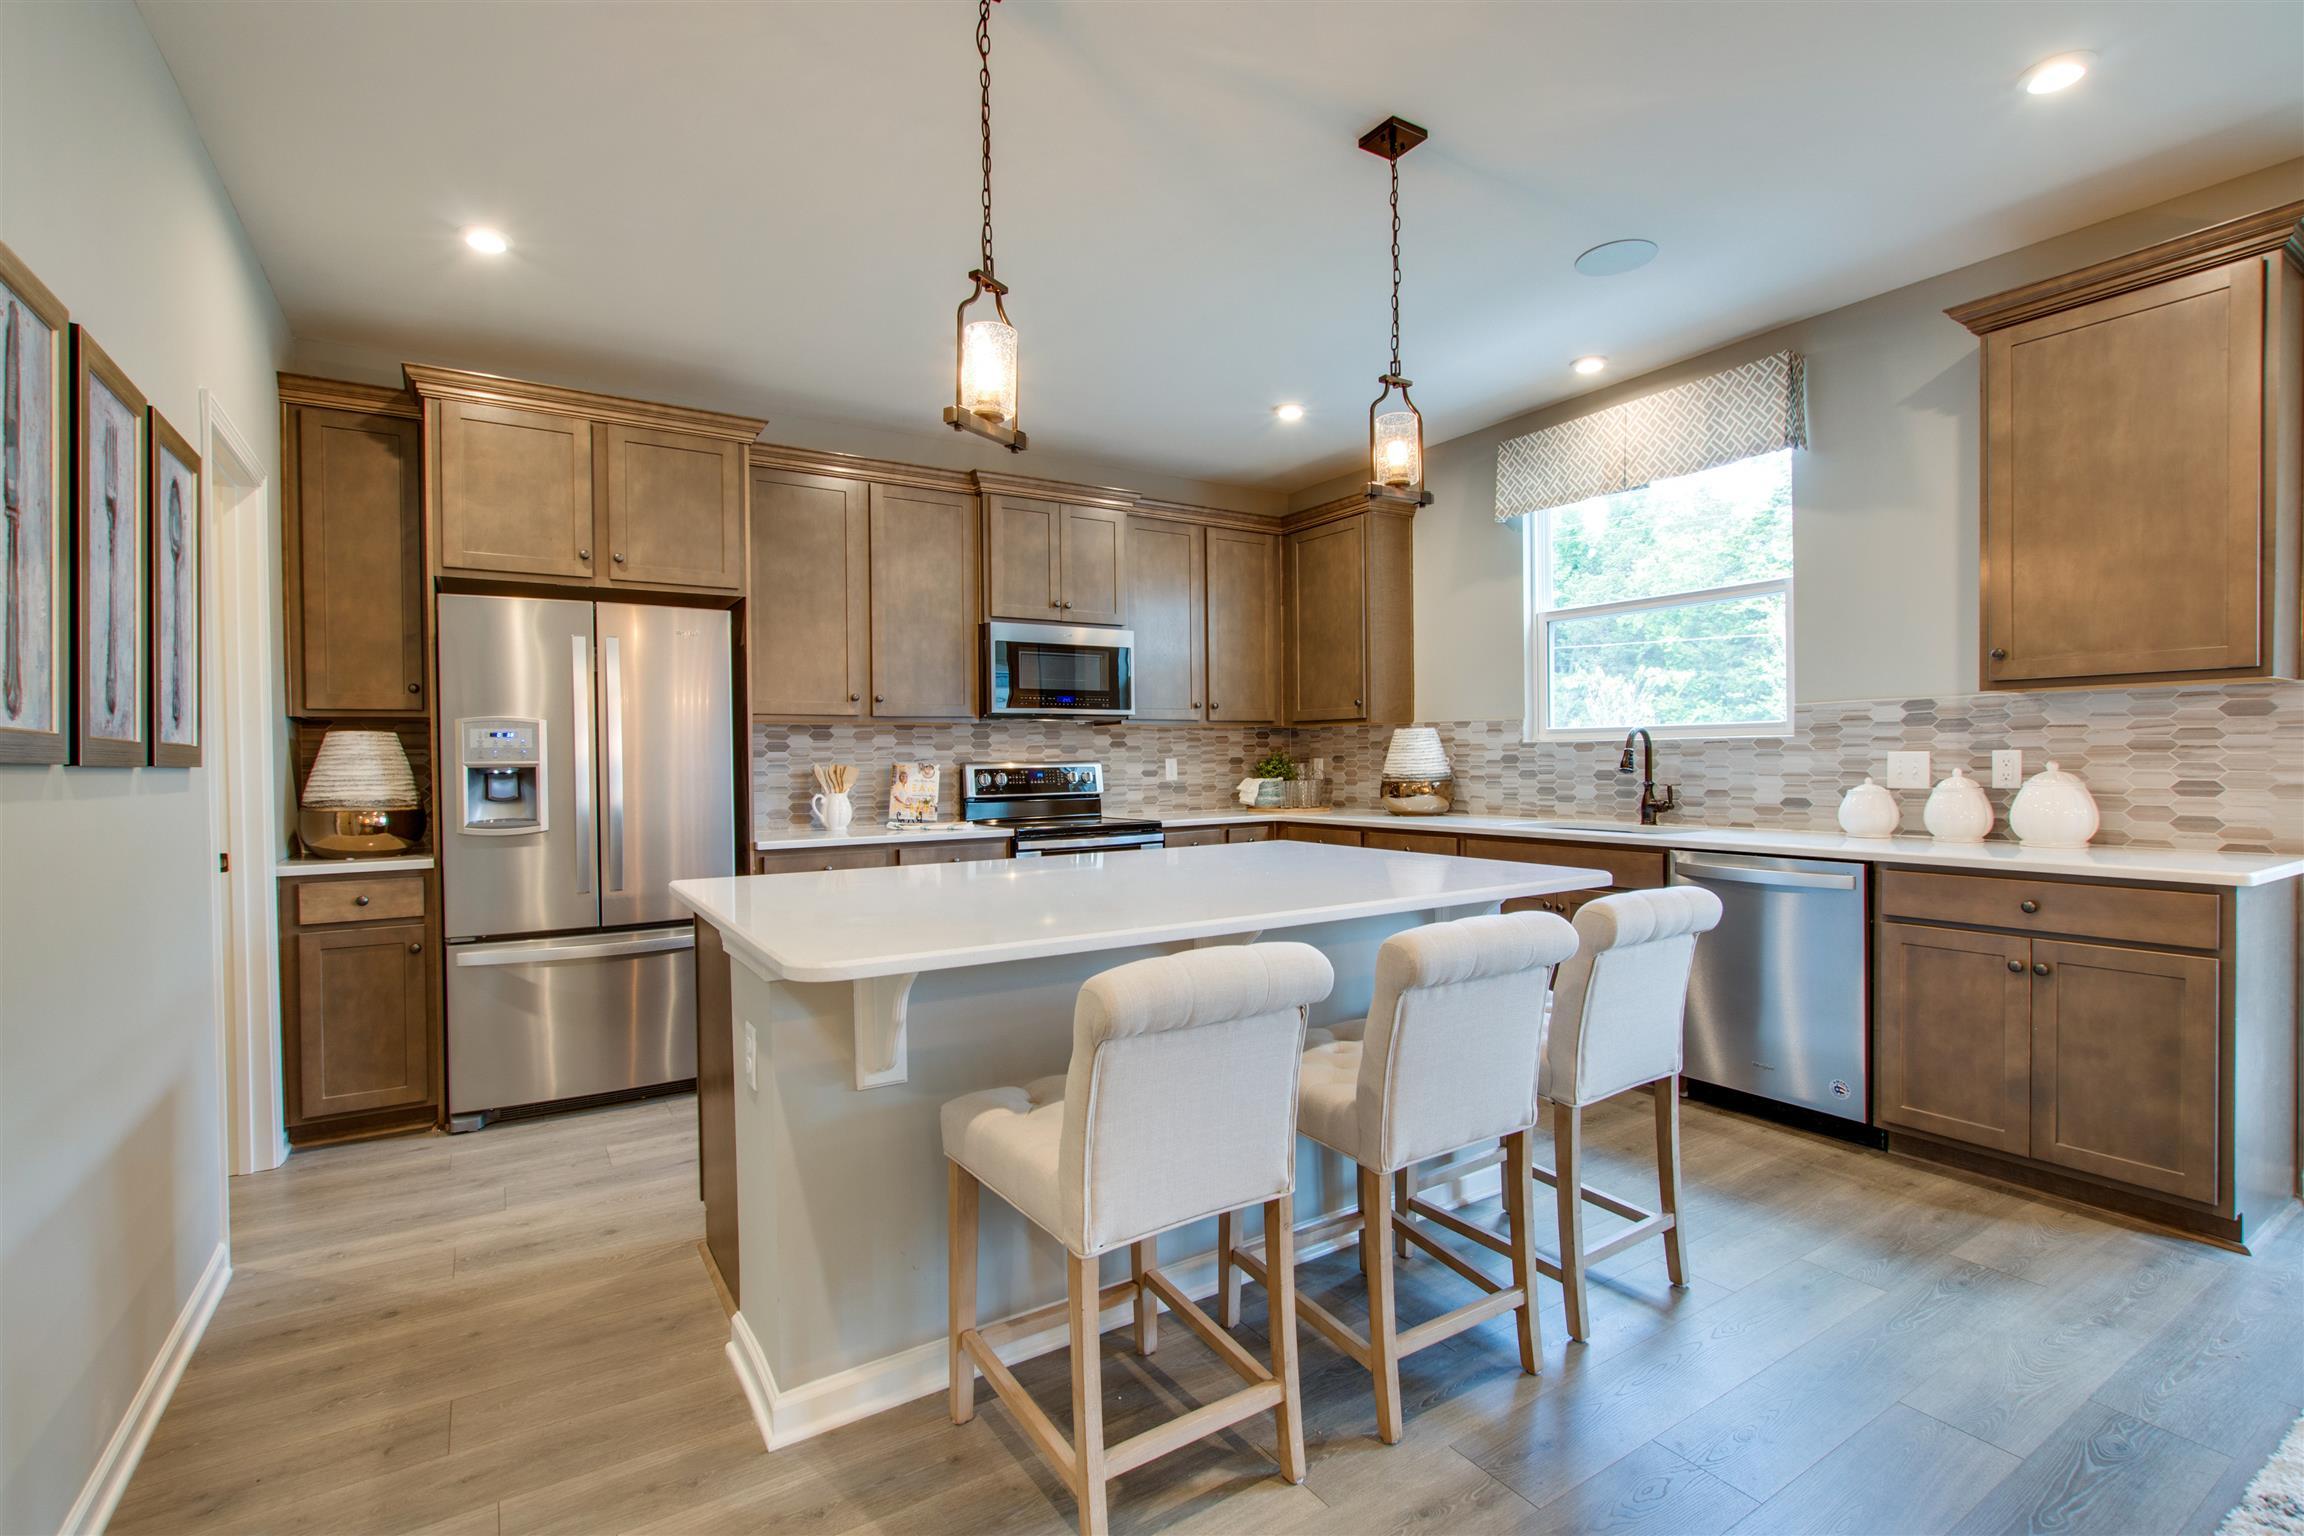 3647 Waterlily Way (Lot 140), Murfreesboro, TN 37129 - Murfreesboro, TN real estate listing